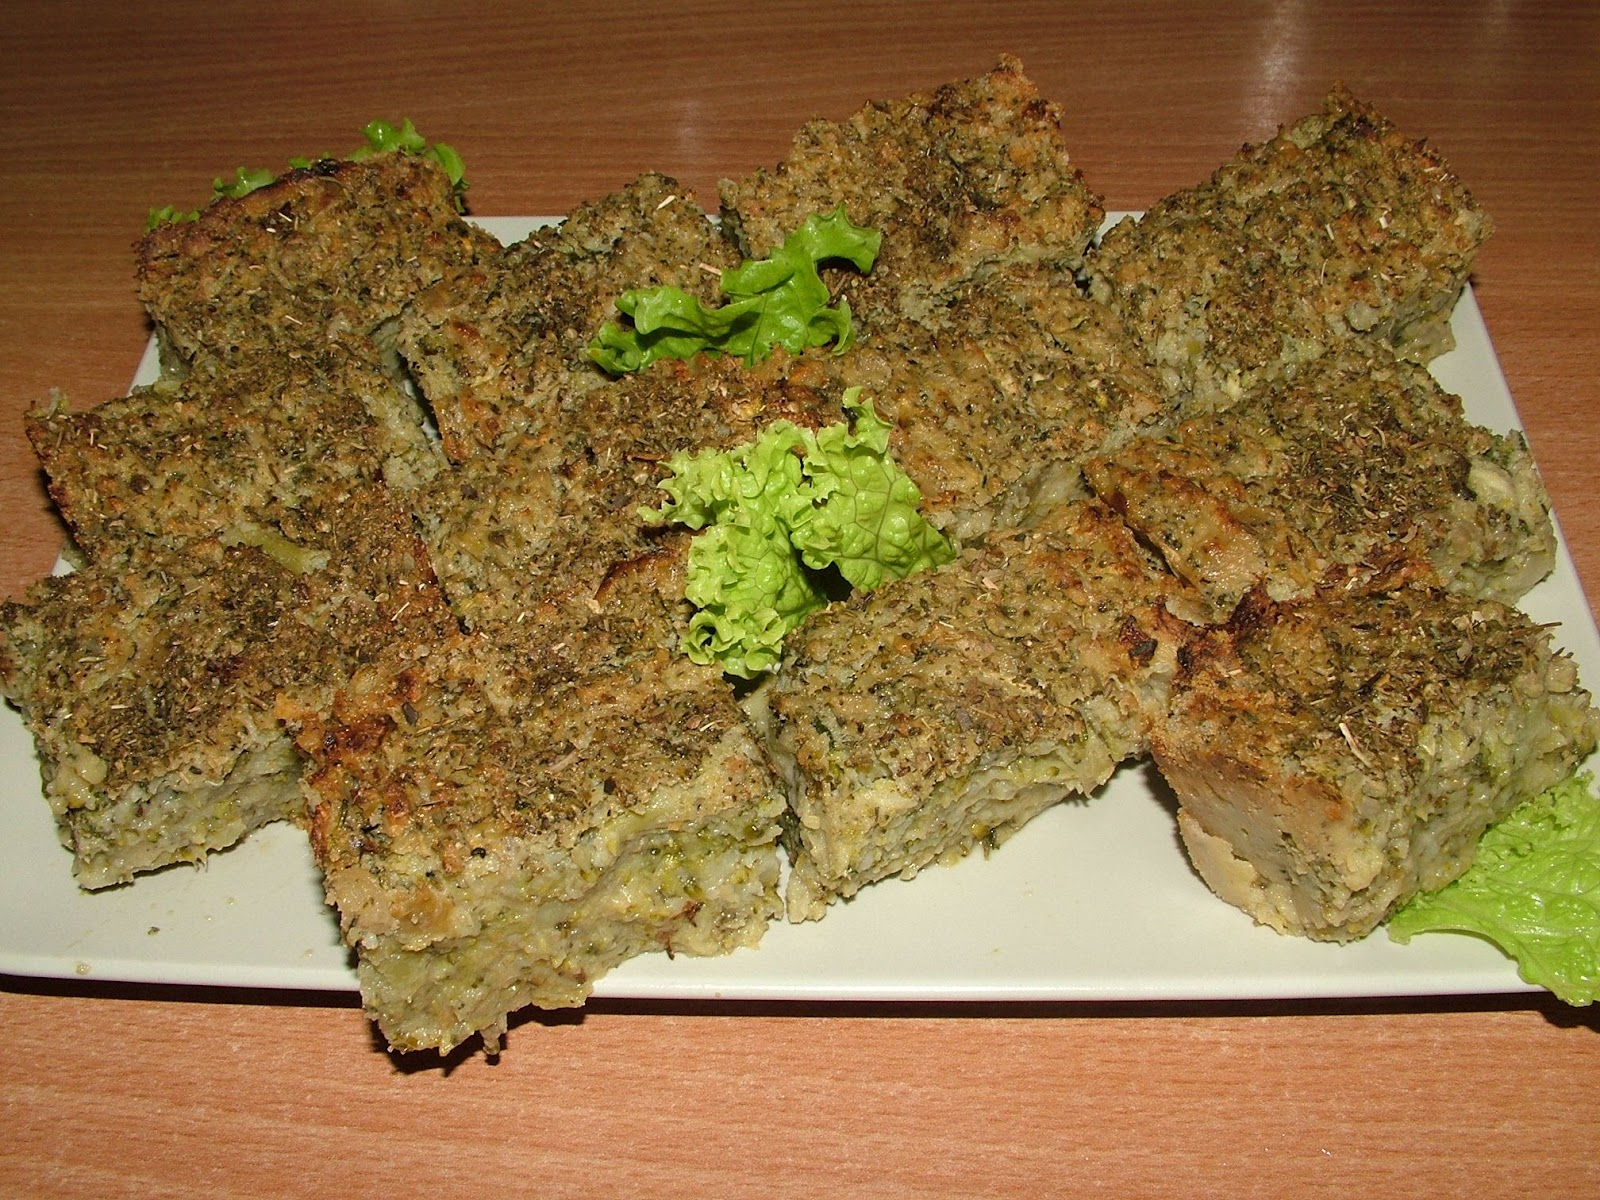 Pasztet z brokuła